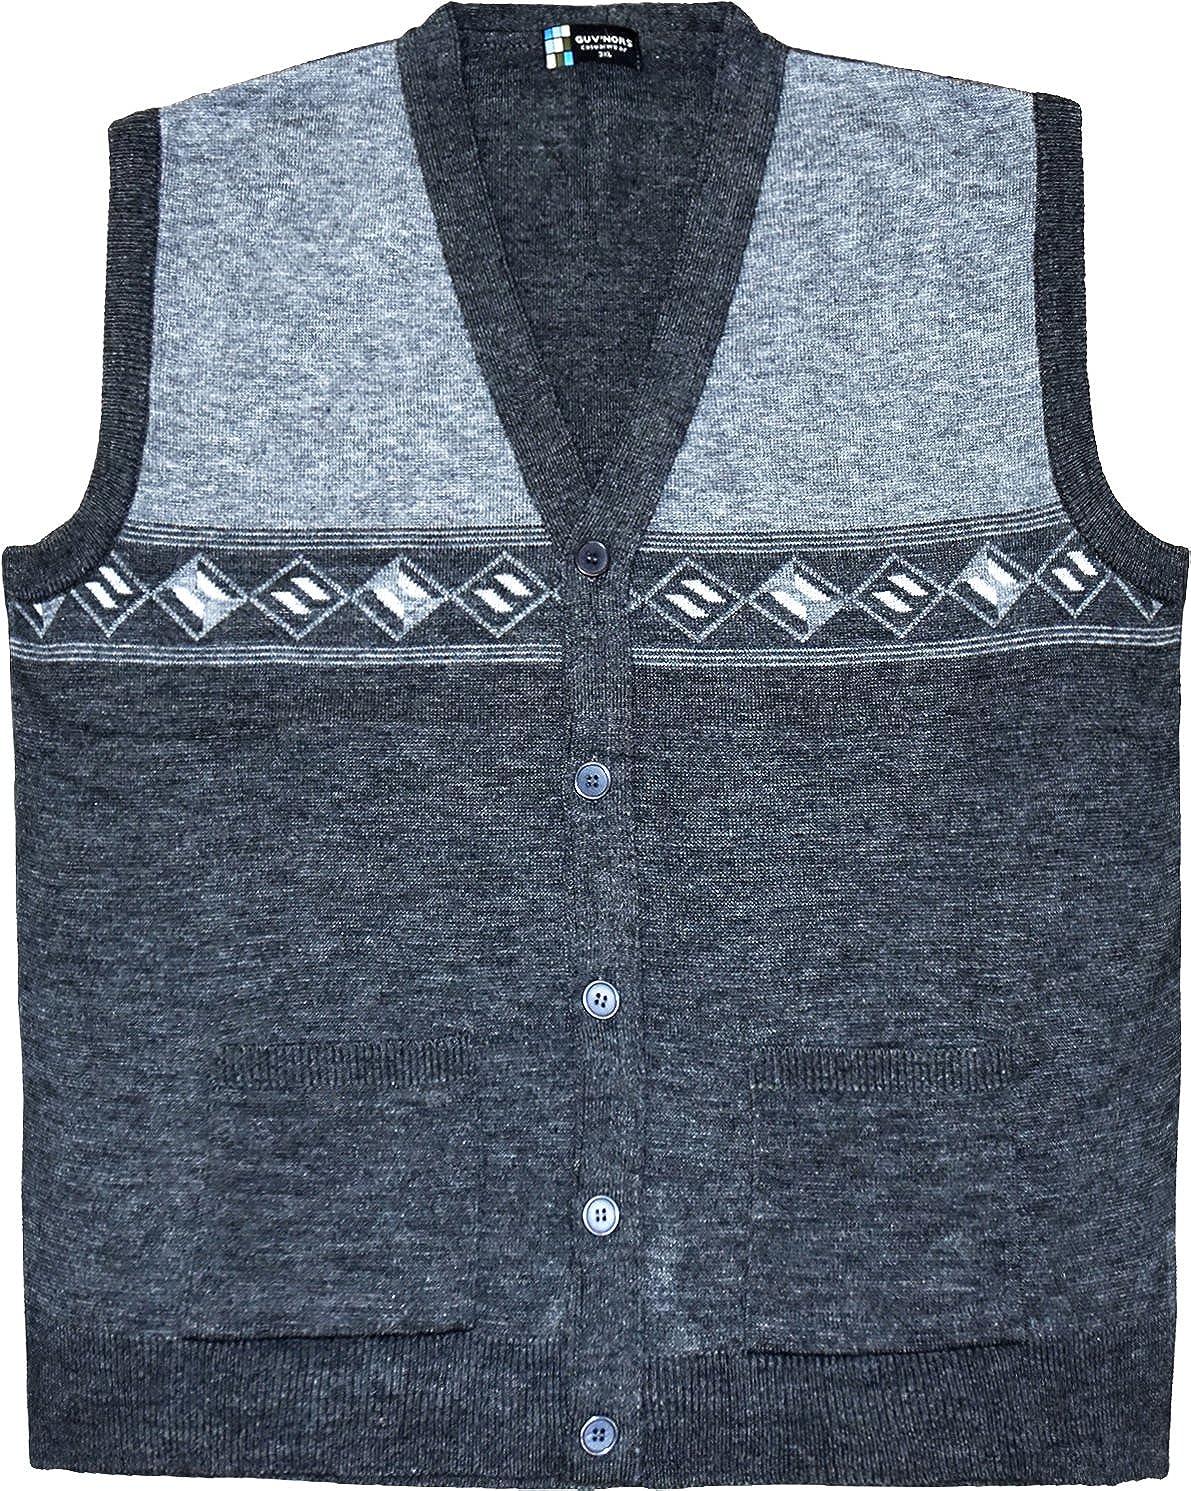 Guvnors Mens Big Sized Knitted Waistcoat Sleeveless Cardigan 3XL 4XL 5XL 6XL